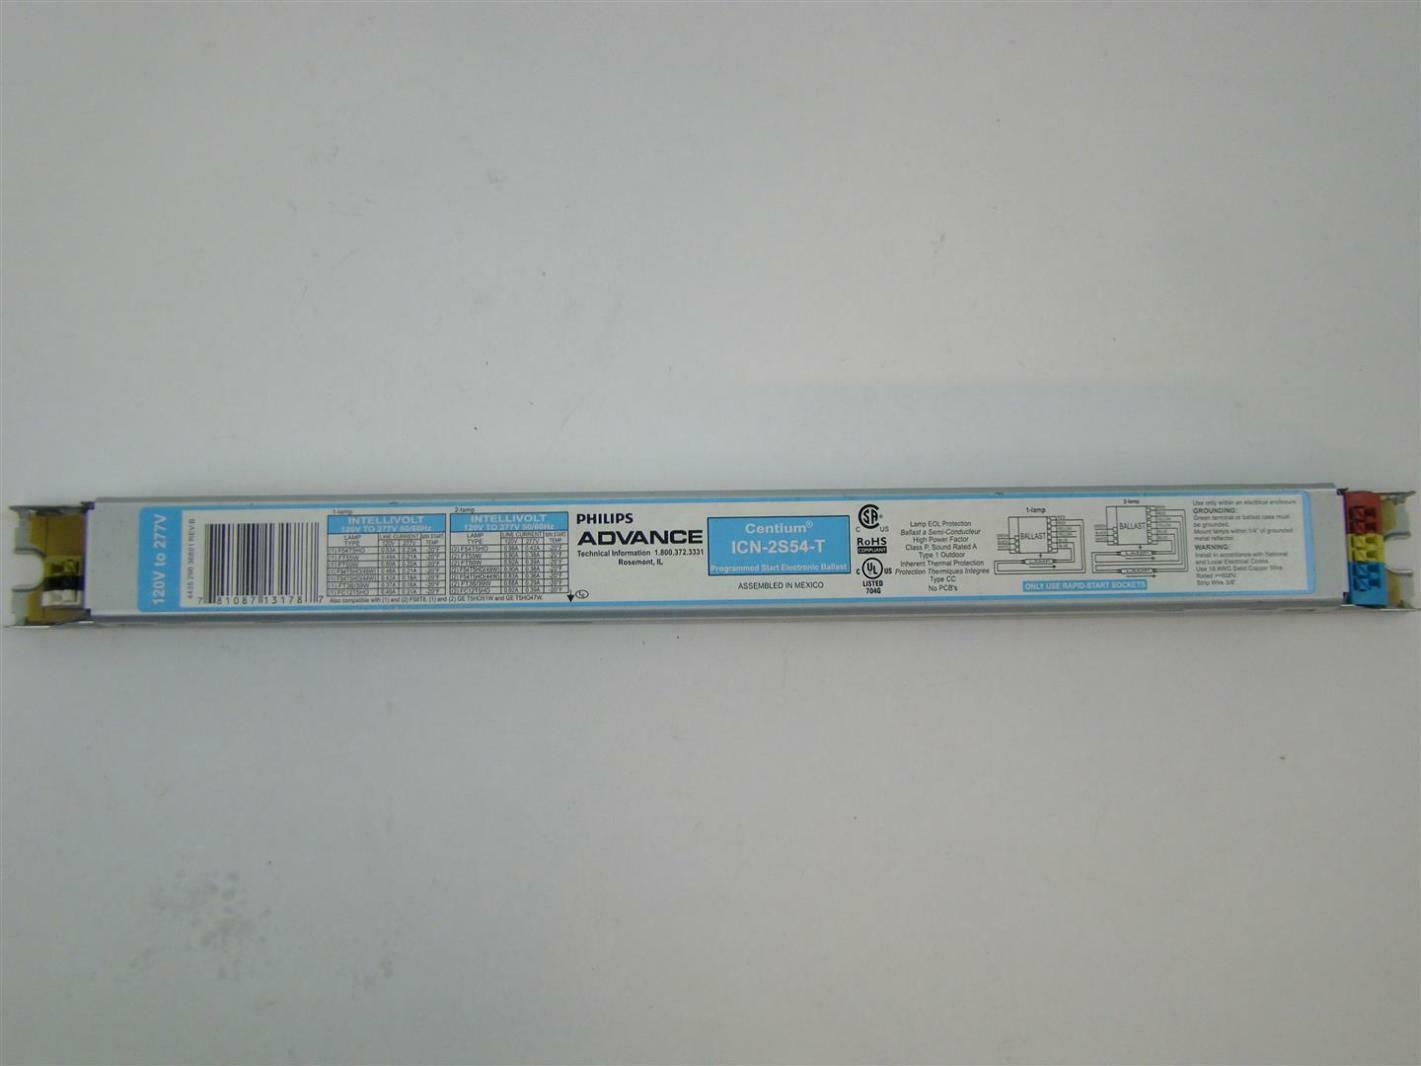 Philips Advance T5 120 277v Intellivolt Ballast Icn 2s54 T Ebay Wiring Diagram 277